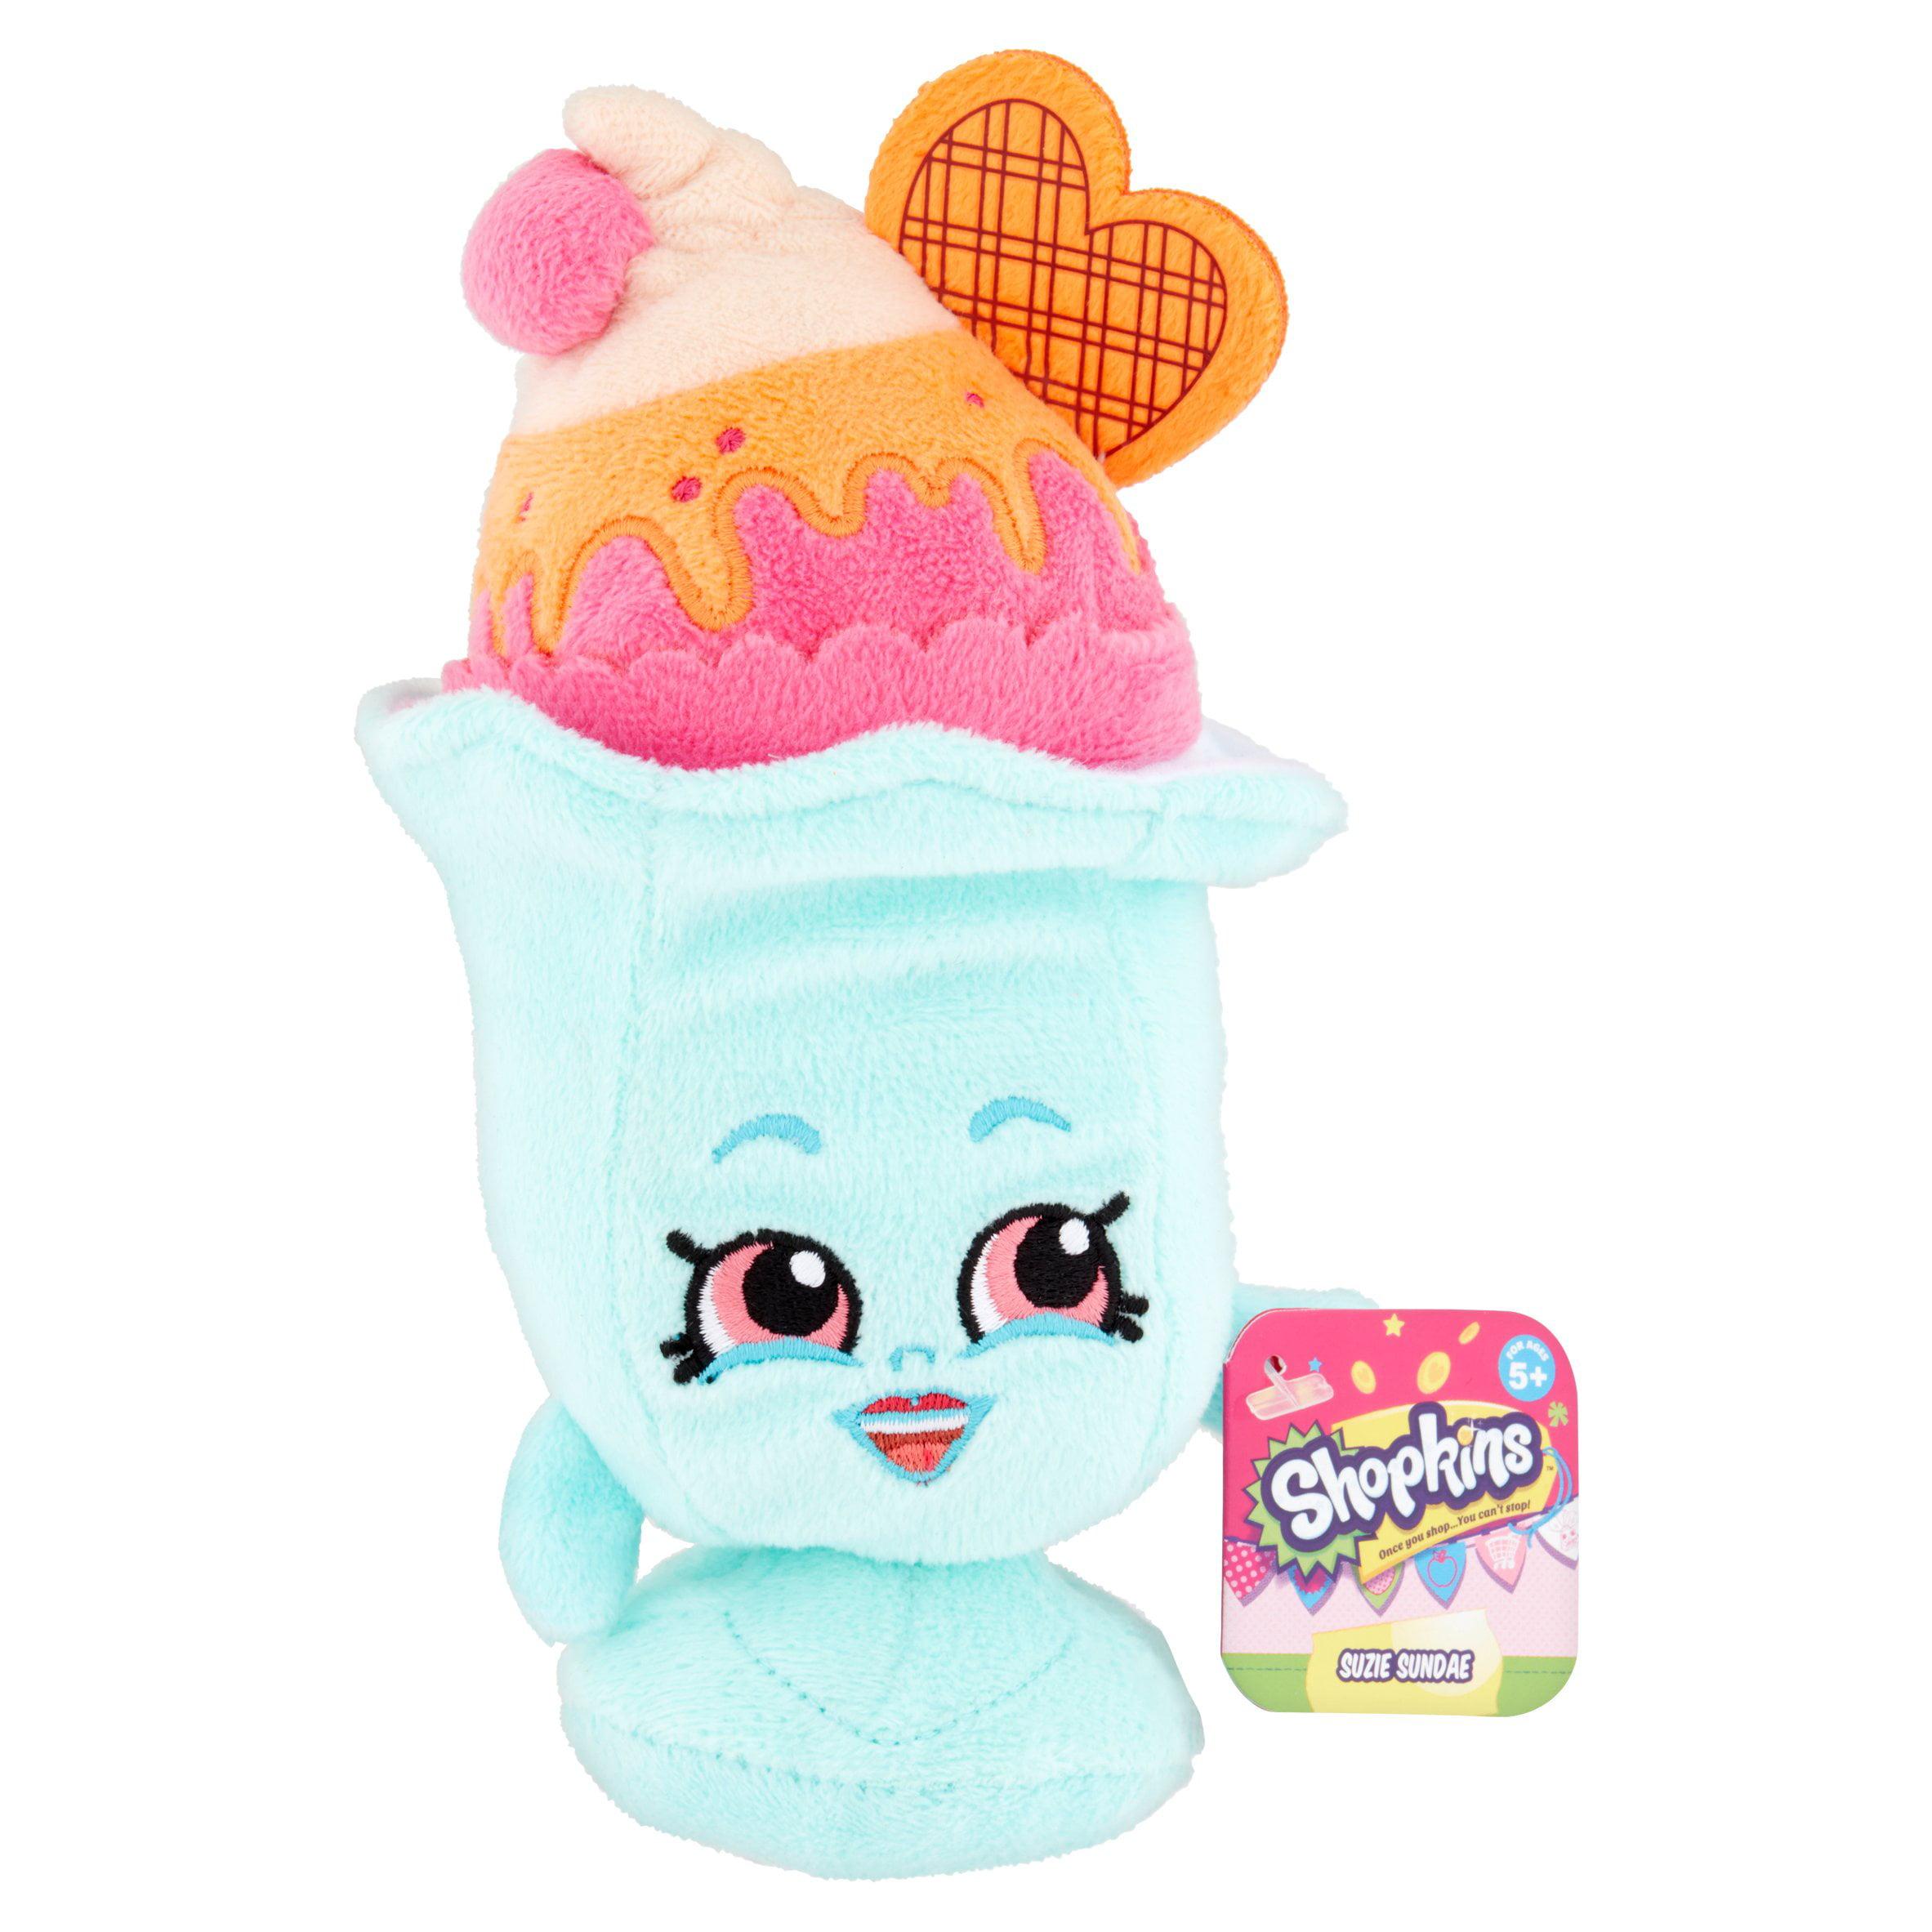 Shopkins Bean Plush Suzie Sundae Toy for Ages 5+